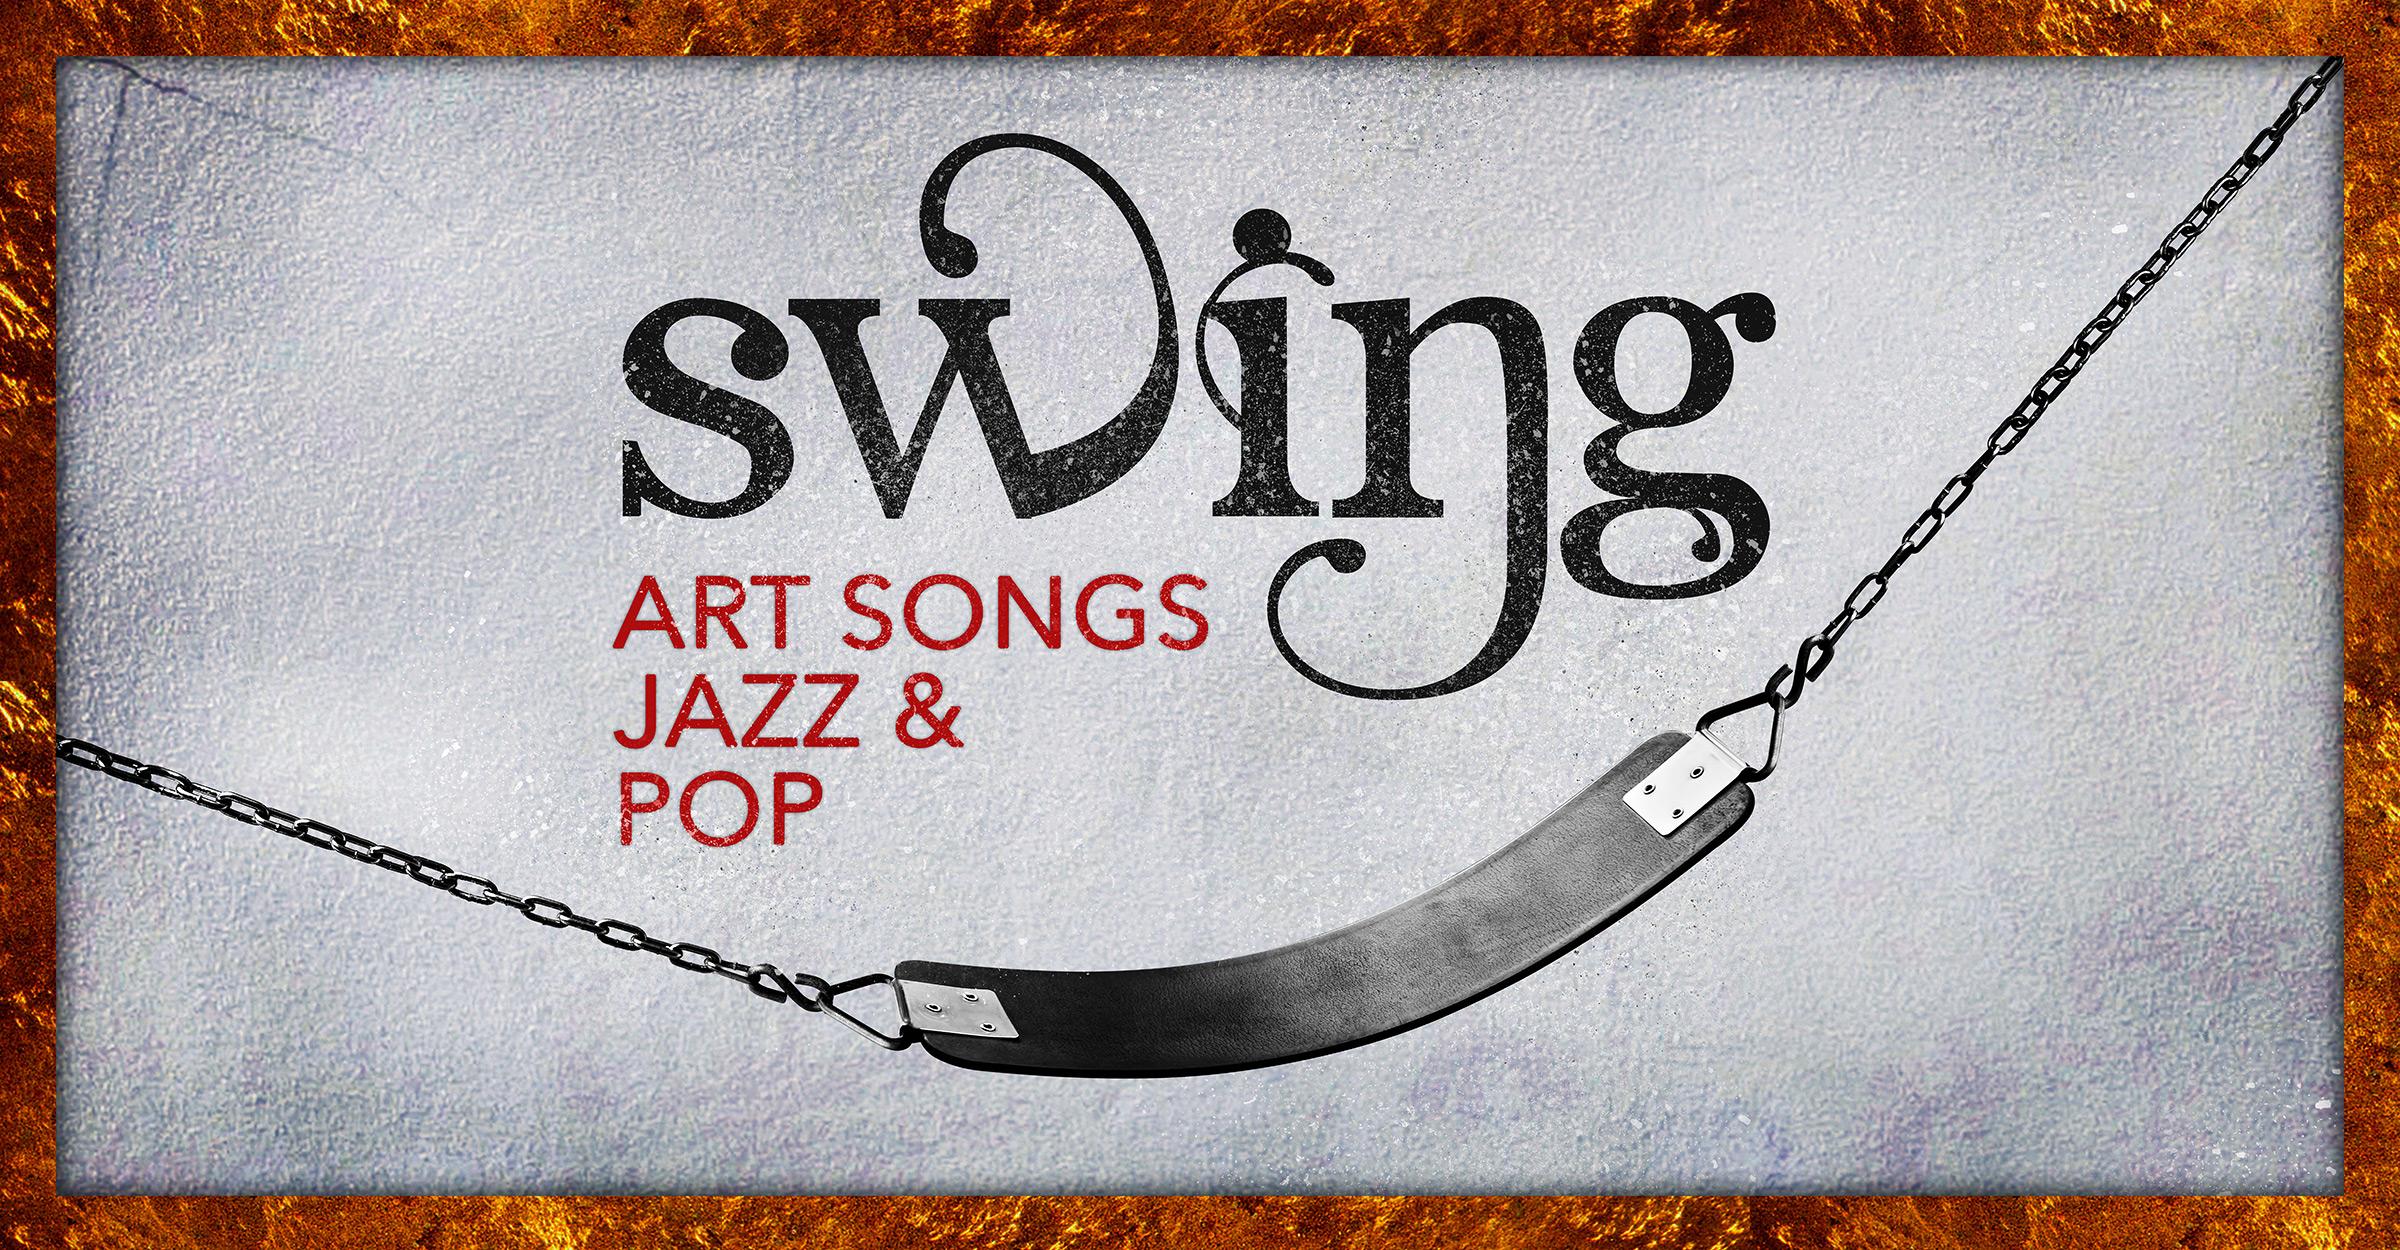 7S-Swing-FinalDraft-FBevent(2400x1250).jpg